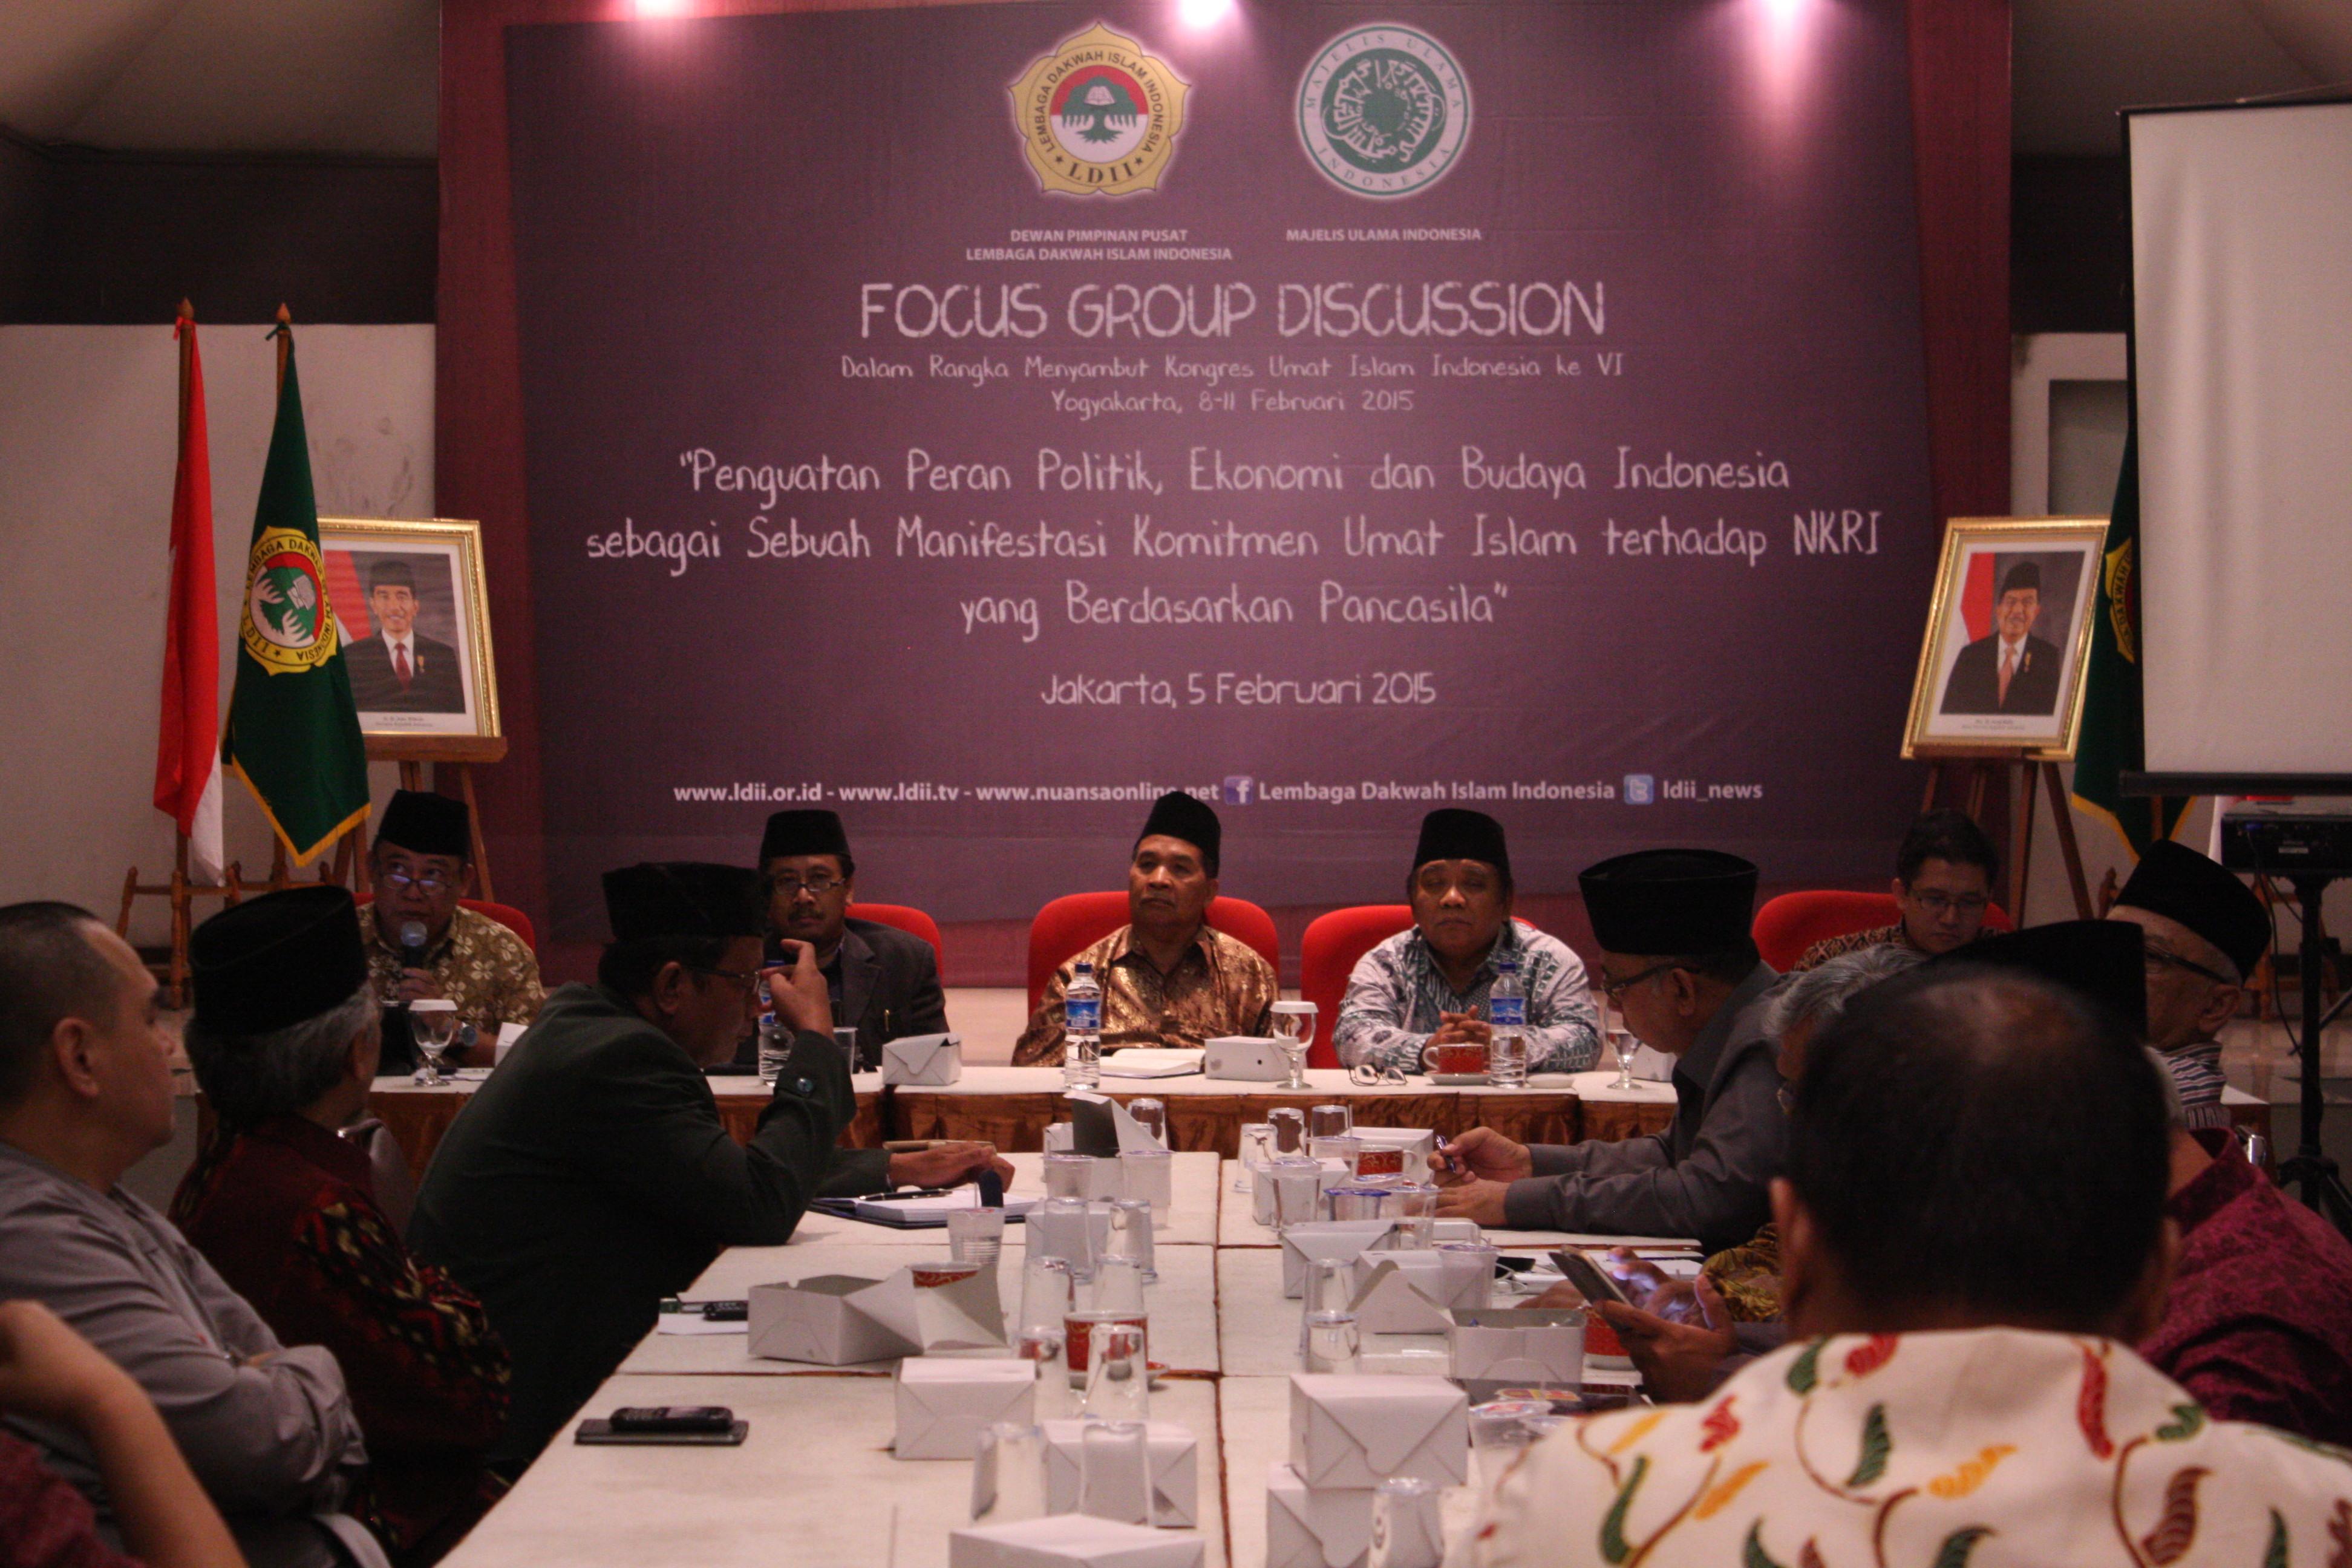 Pra Kongres Umat Islam Indonesia dalam FGD LDII